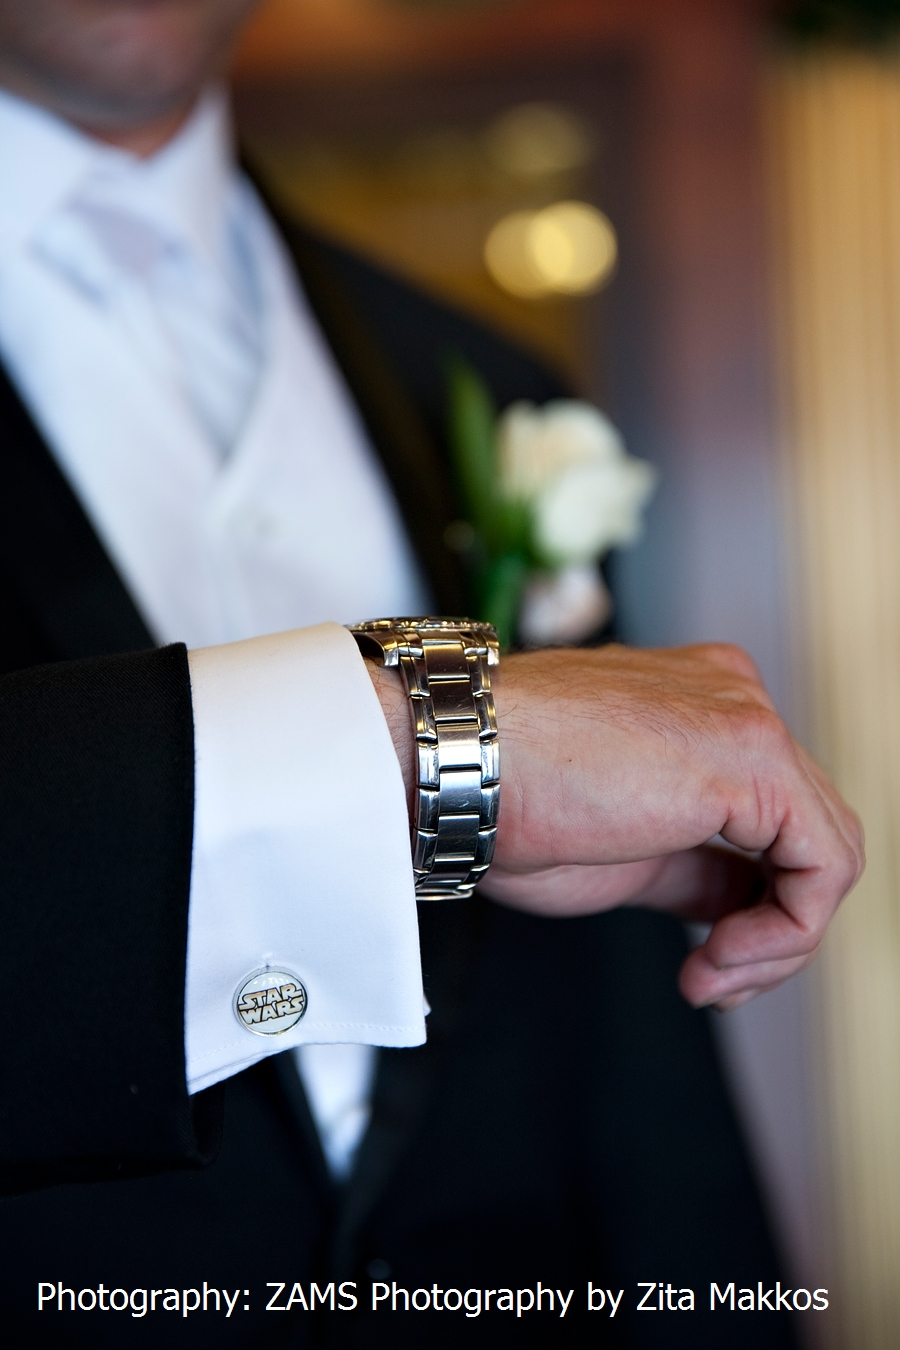 argentina_flags_world_collection_cuff_links_men_weddings_groomsmen_grooms_dads_gifts_cufflinks_4.jpg